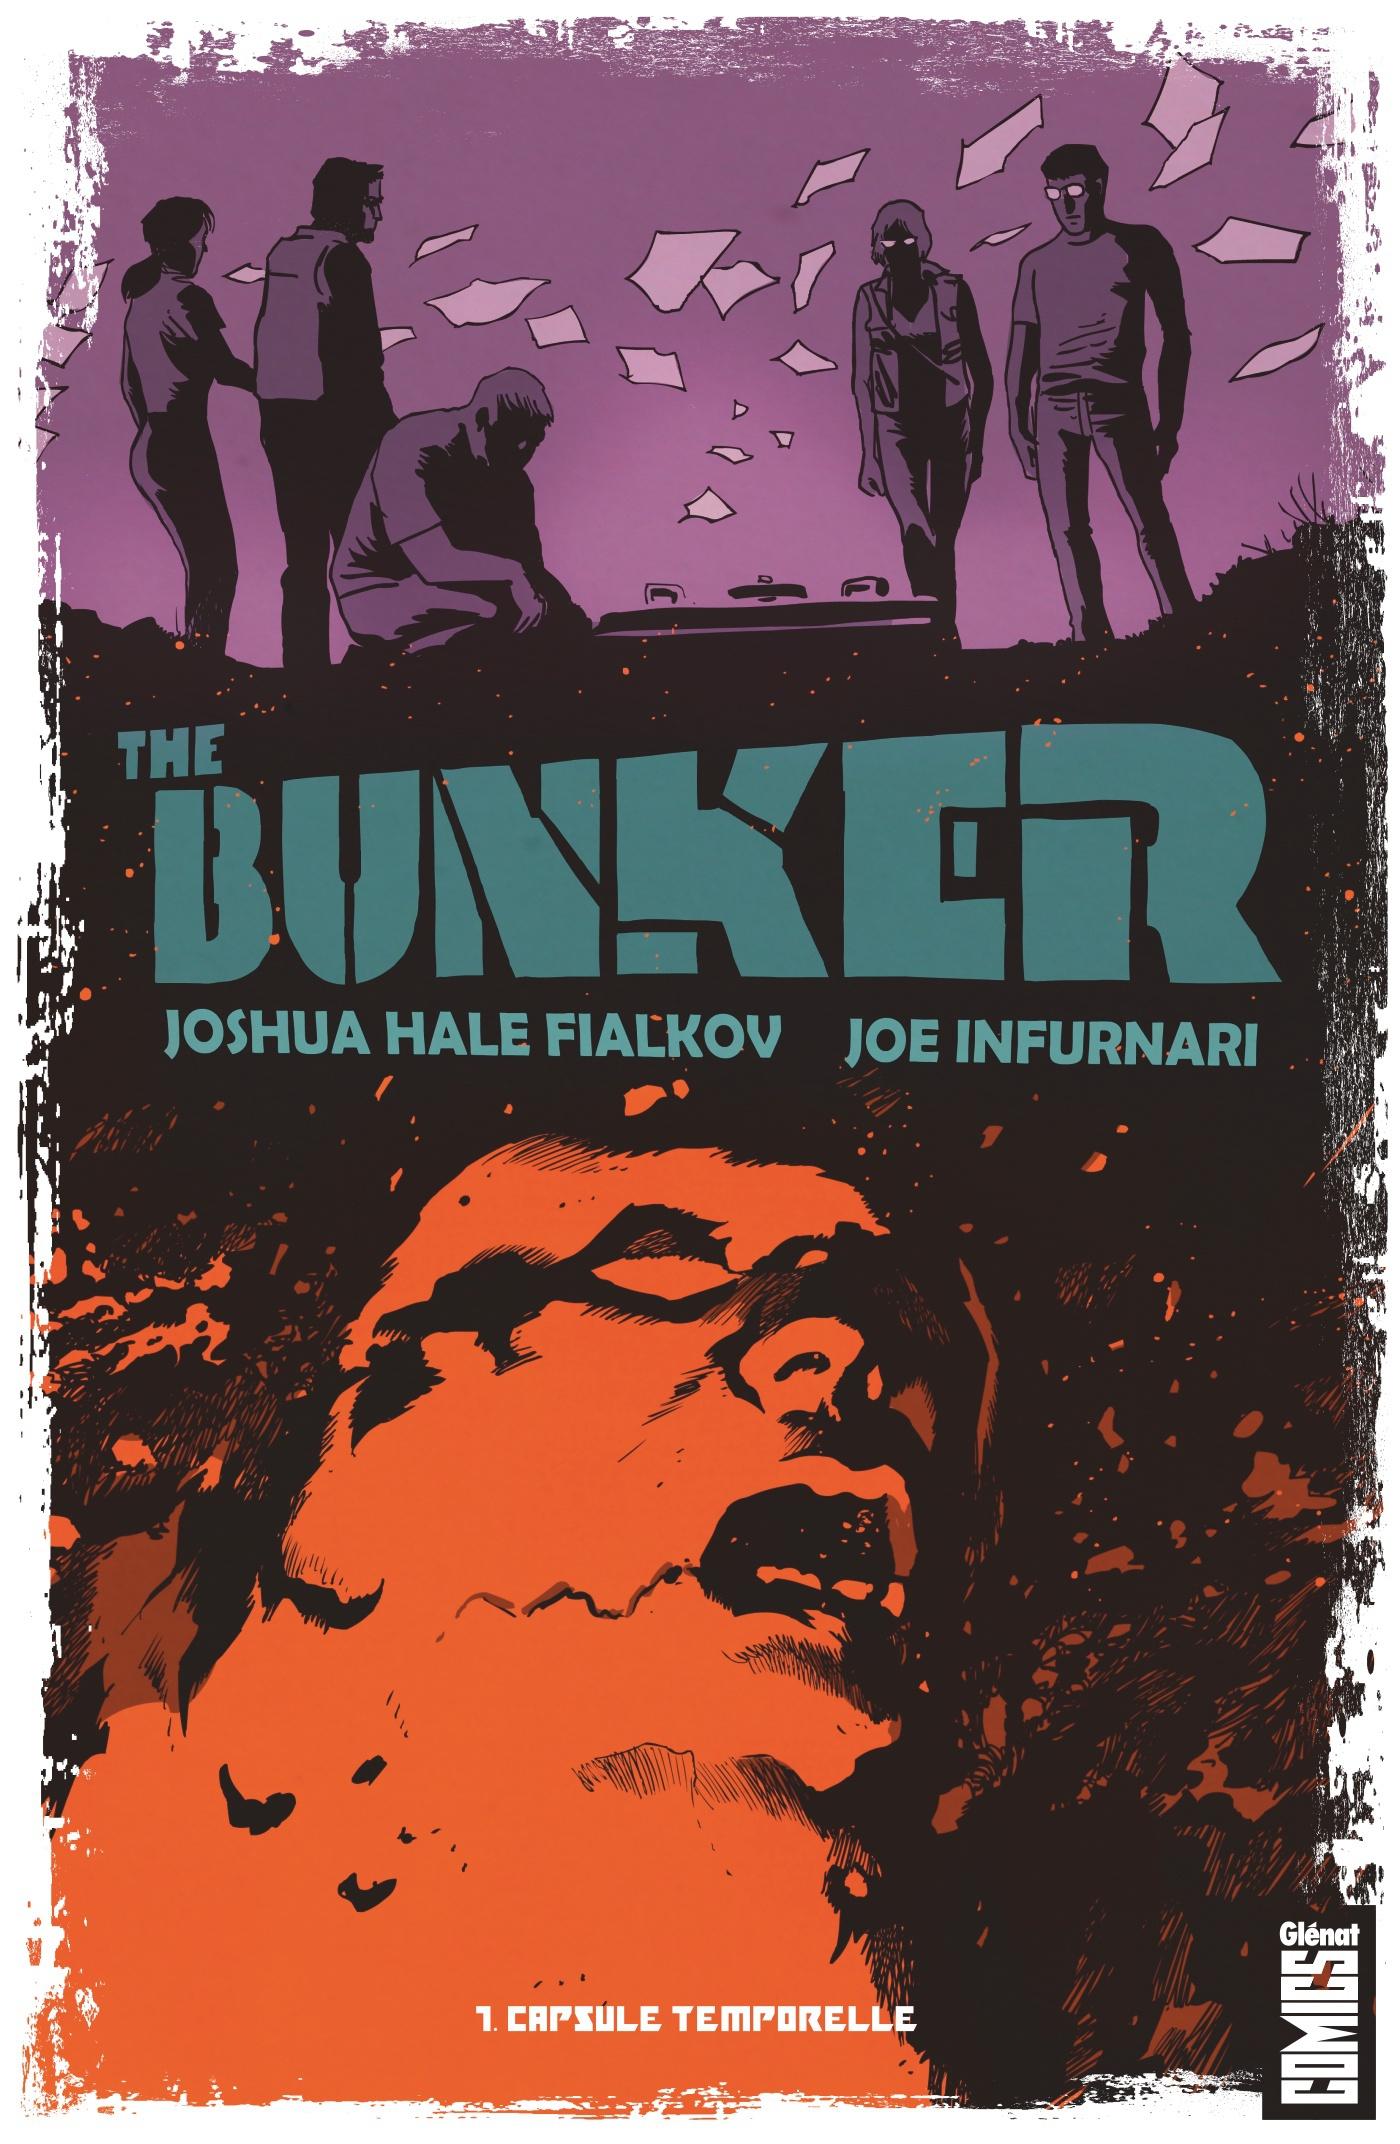 The Bunker 1 - Capsule temporelle